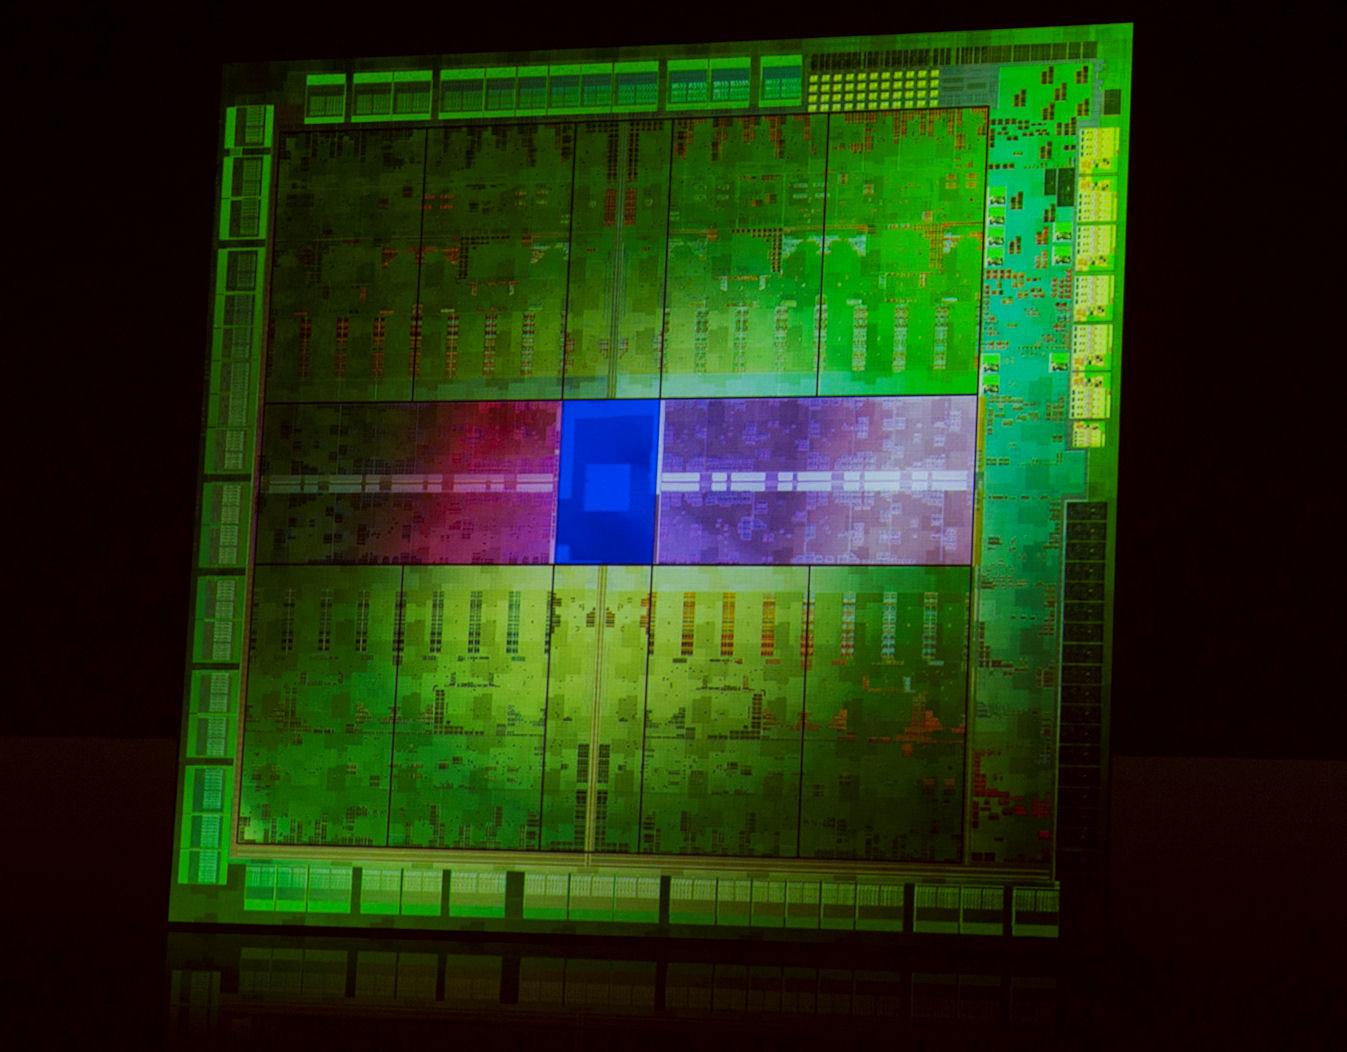 Erster Test der Nvidia GeForce GTX 680 | Quelle: hkepc.com